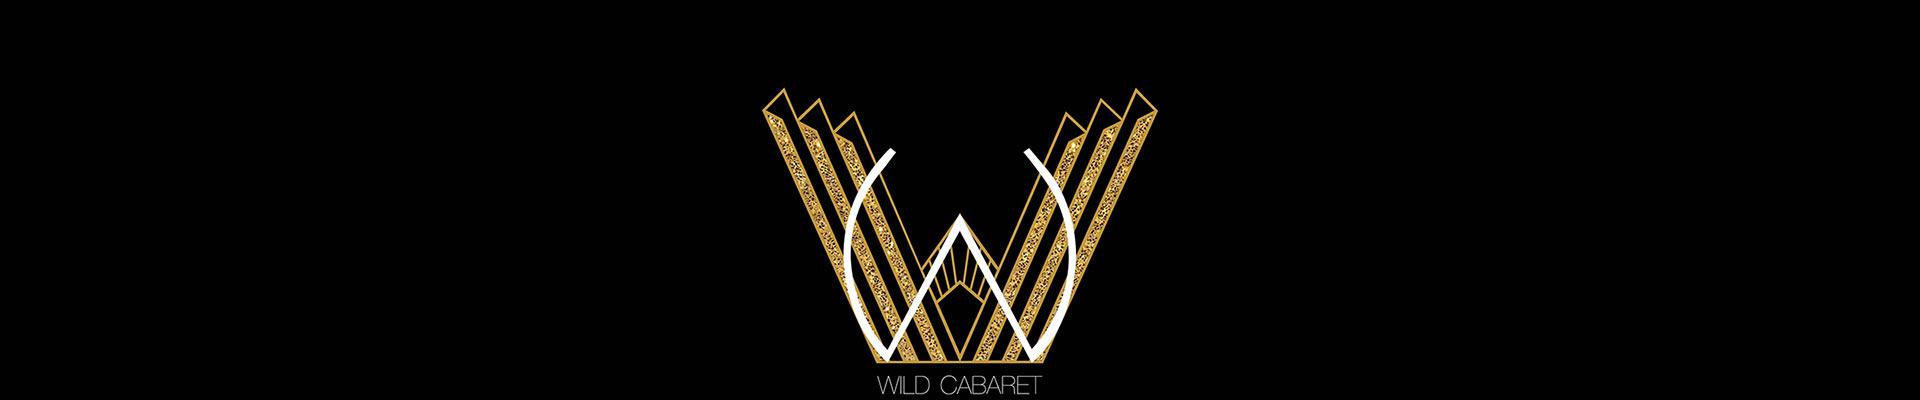 WildCabaretB1920x400